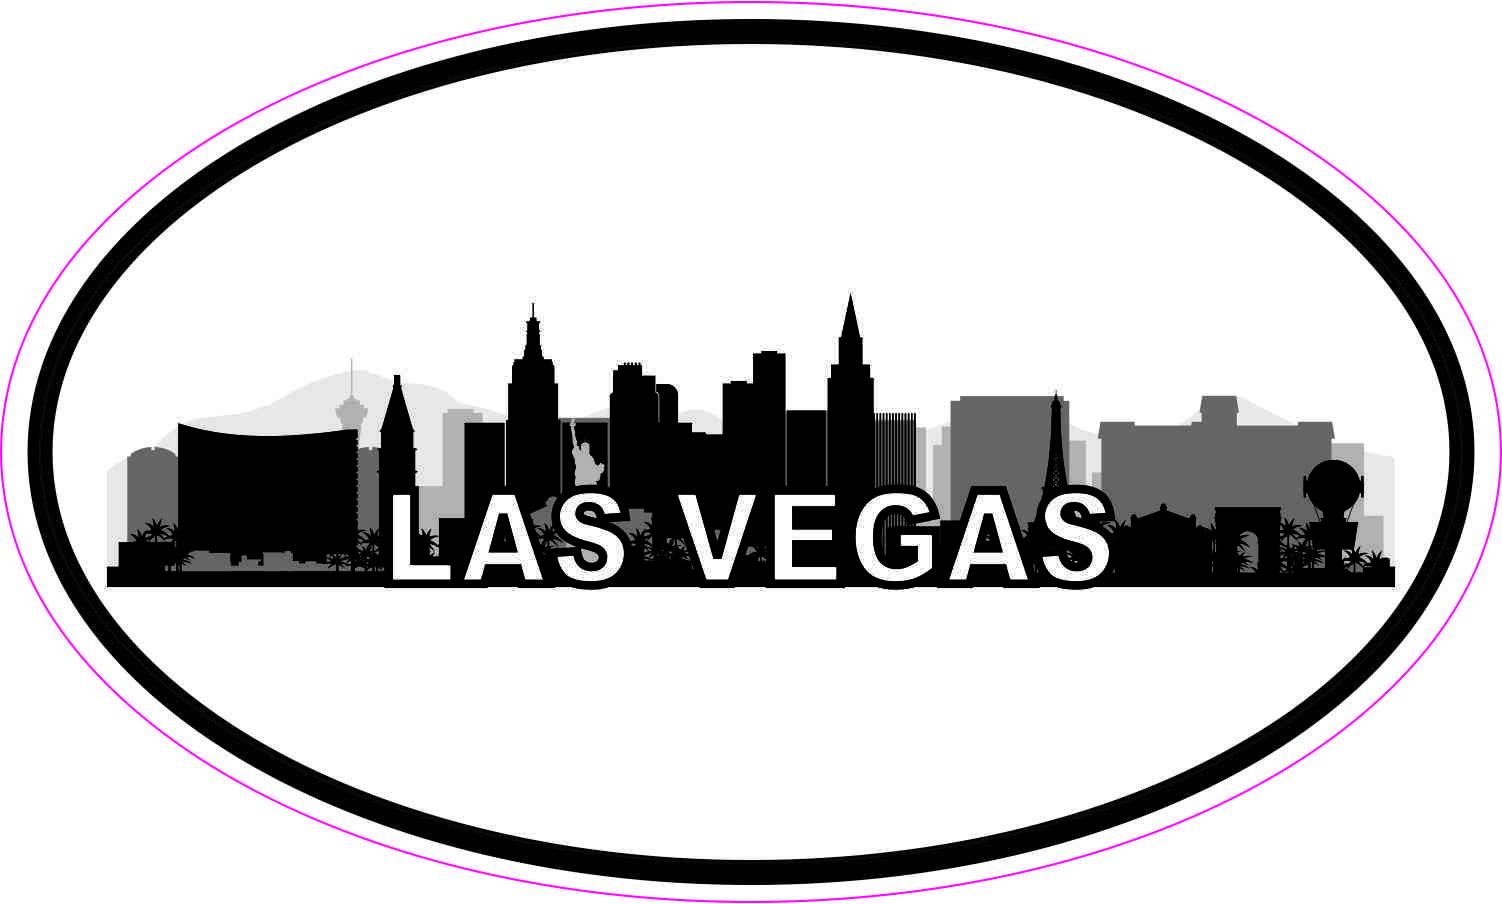 5in X 3in Oval Las Vegas Skyline Sticker Luggage Decal Car Travel Stickers Vegas Skyline Las Vegas Travel Stickers [ 904 x 1502 Pixel ]